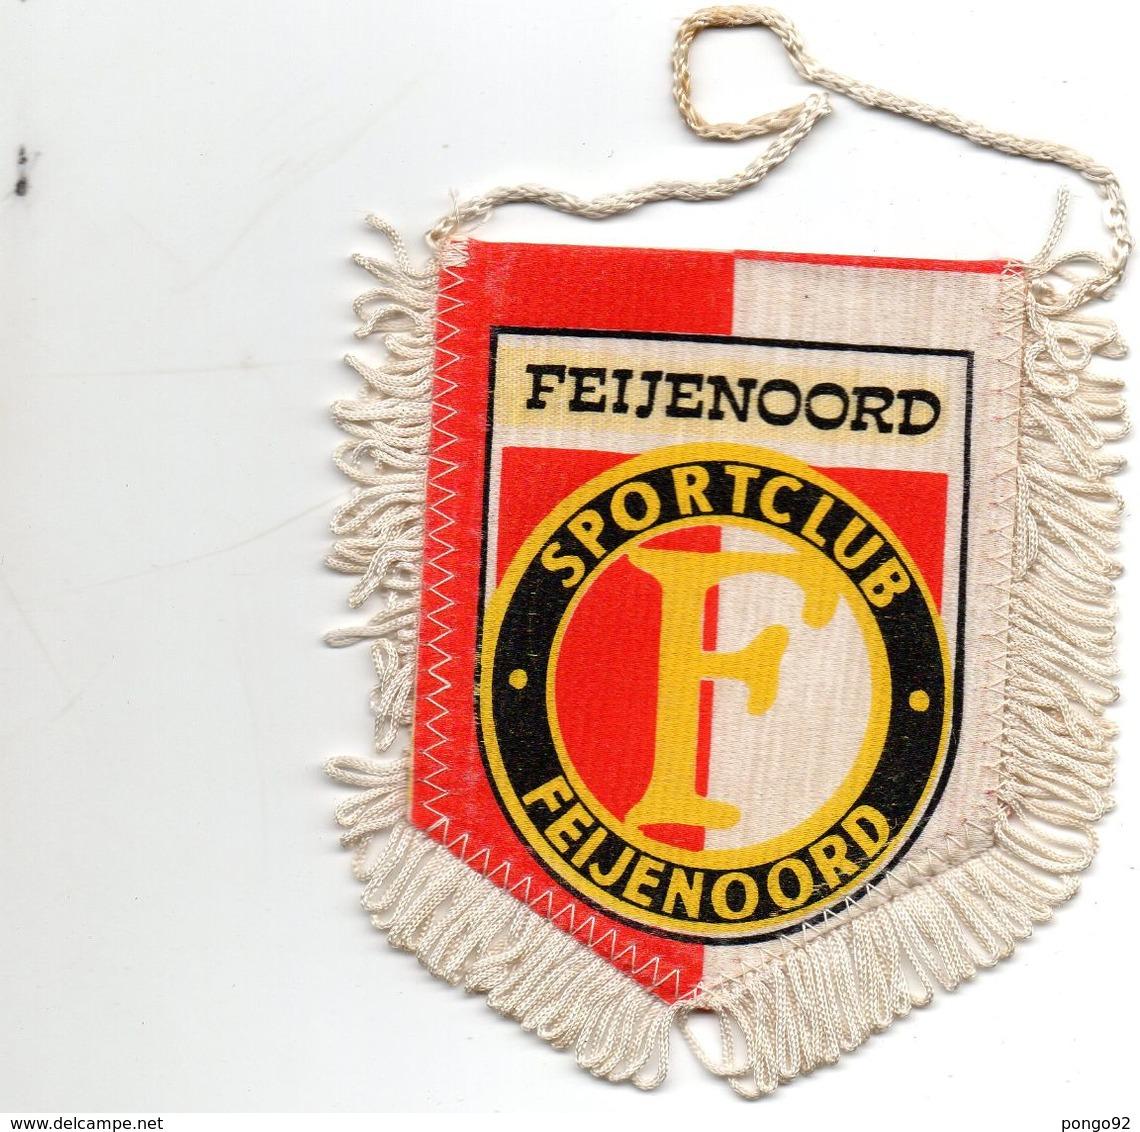 Fanion Football, FEIJENOORD SPORTCLUB - Habillement, Souvenirs & Autres